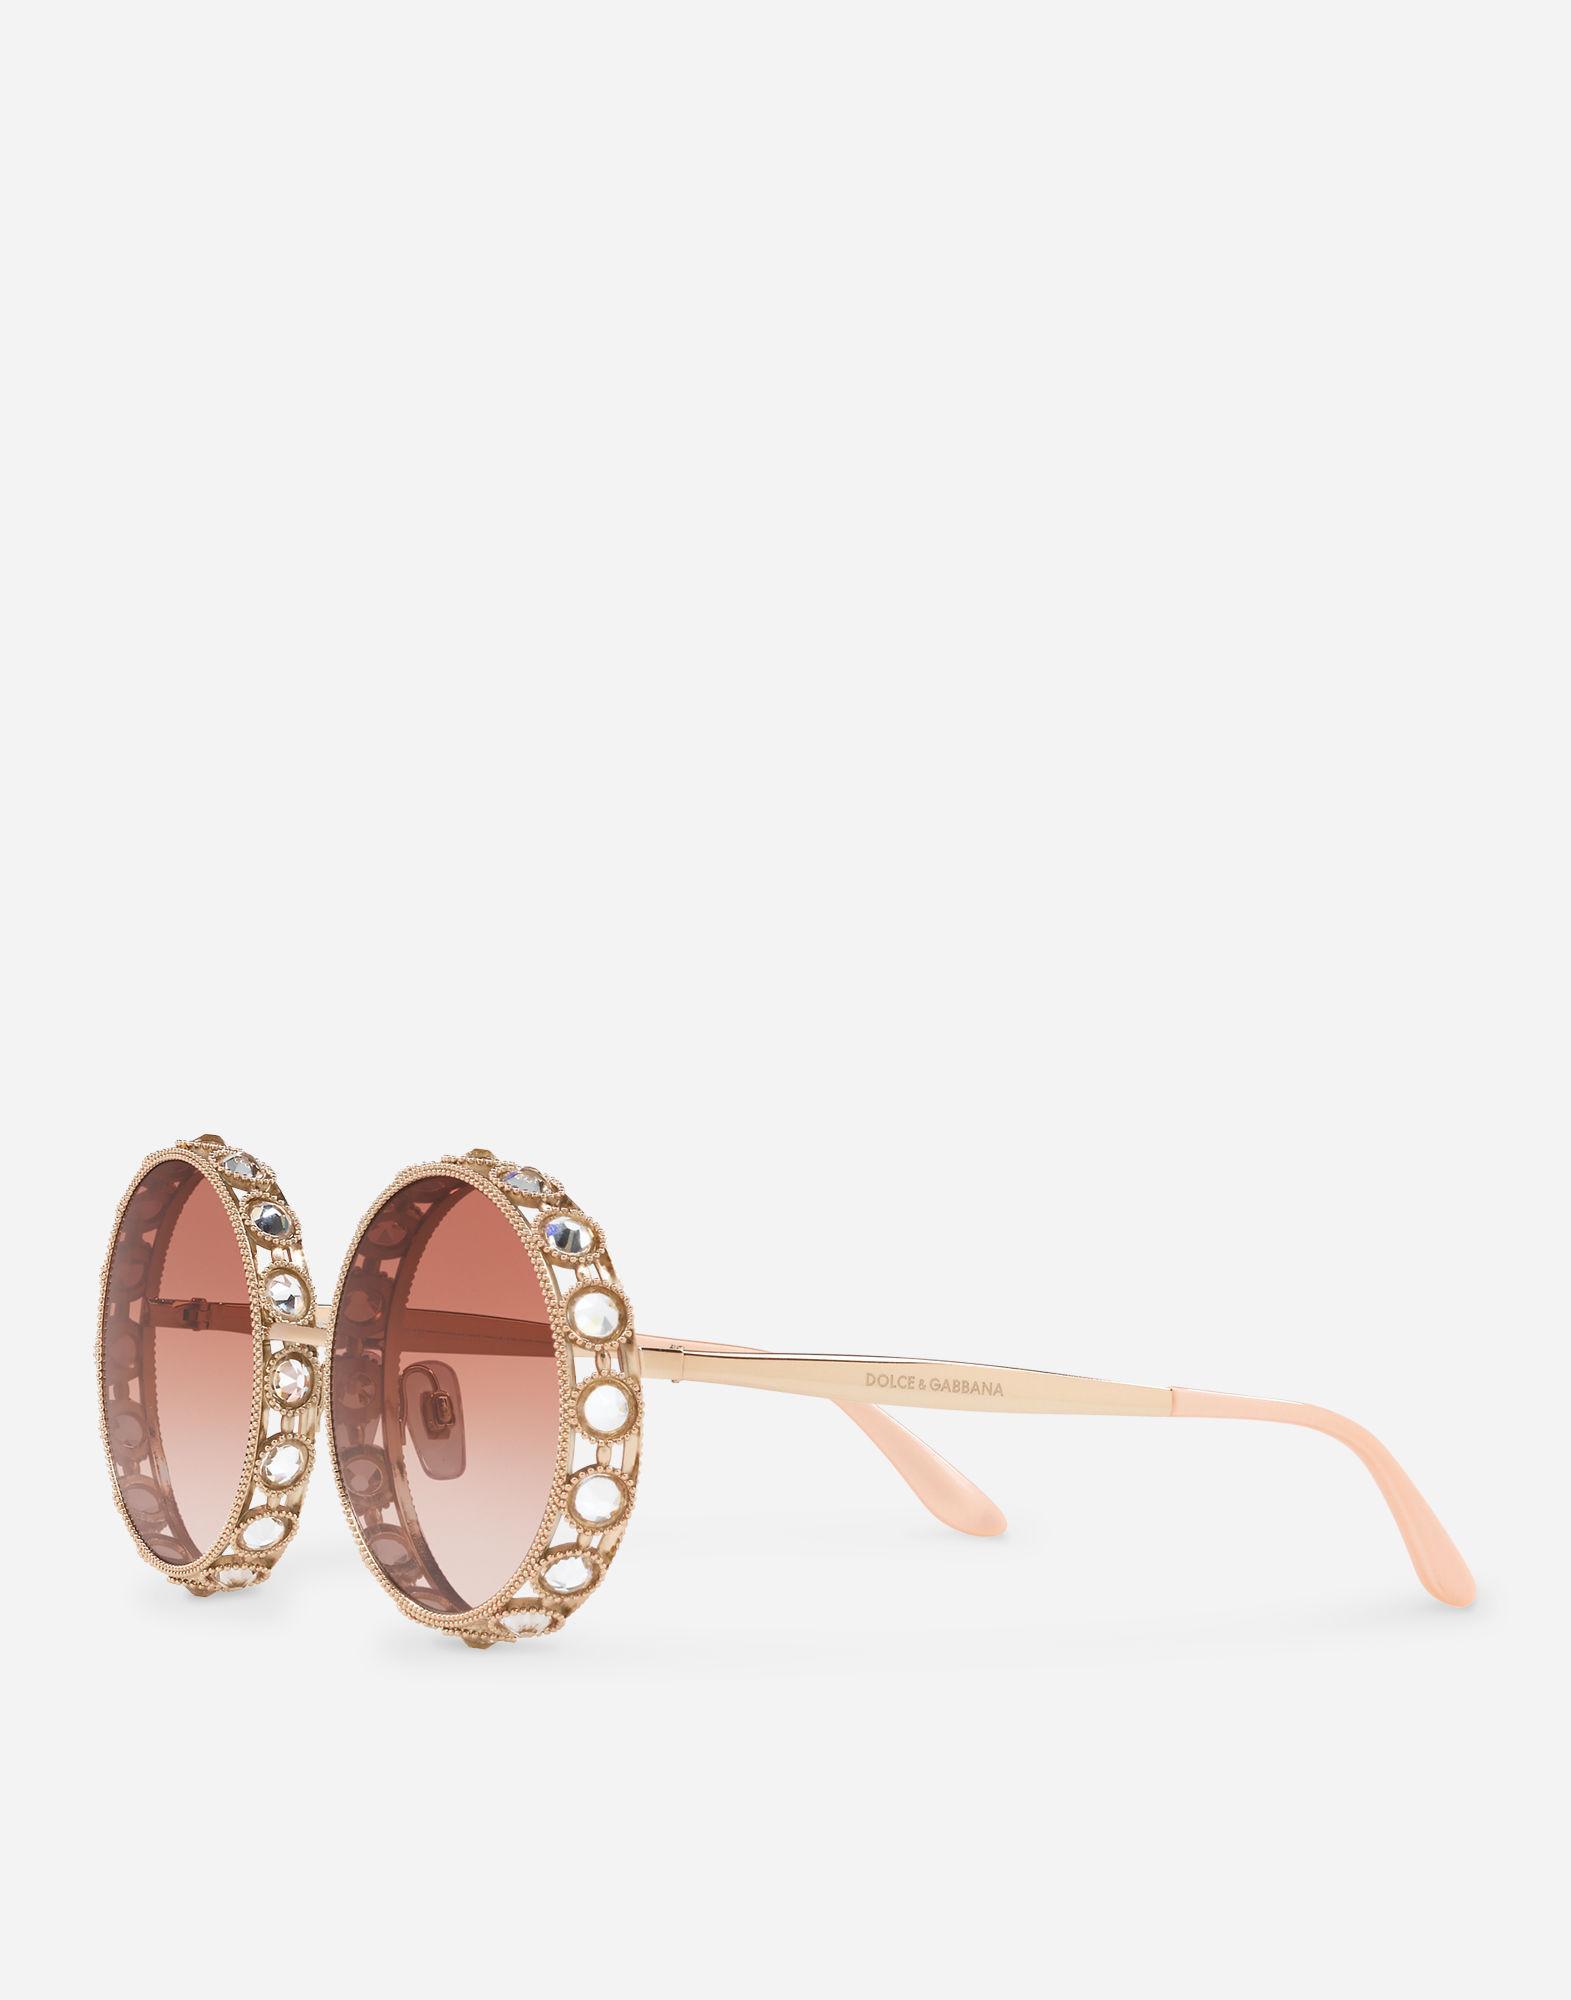 3c4d2f985ca9 Dolce   Gabbana Swarovski Crystal-Embellished Round-Frame Rose Gold-Tone  Sunglasses In